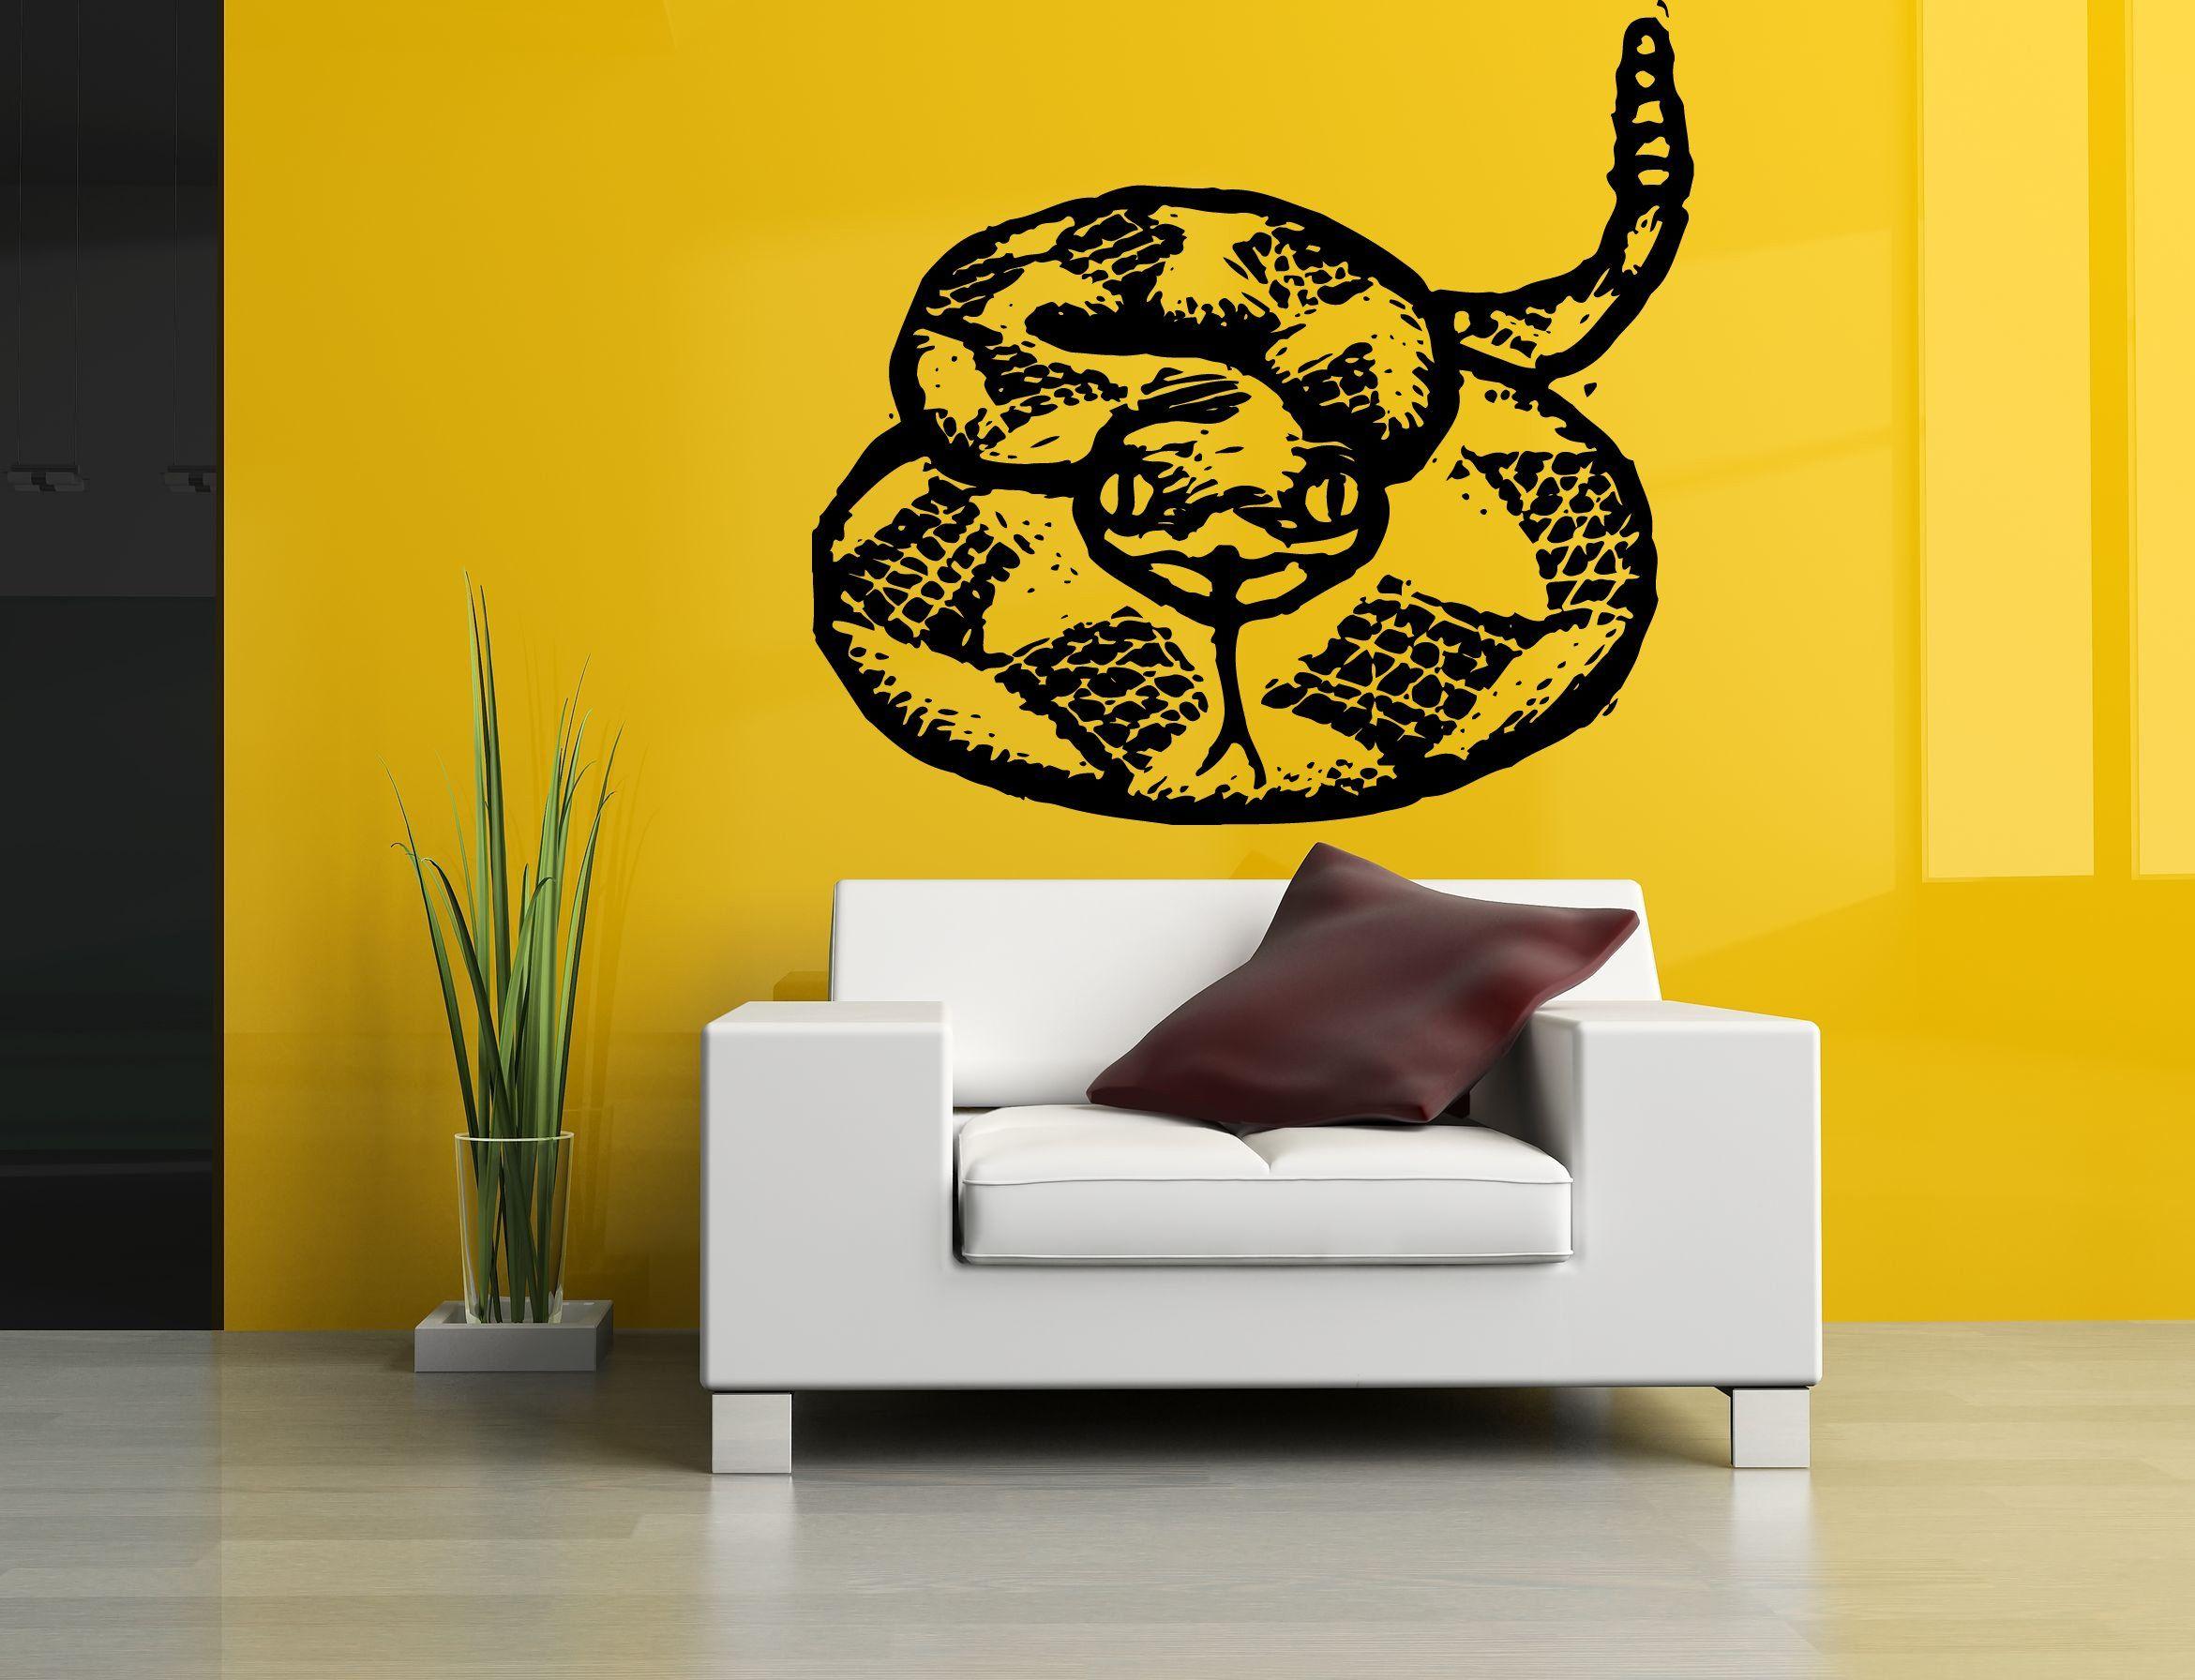 Wall Room Decor Art Vinyl Sticker Mural Decal Snake Rattlesnake Big ...